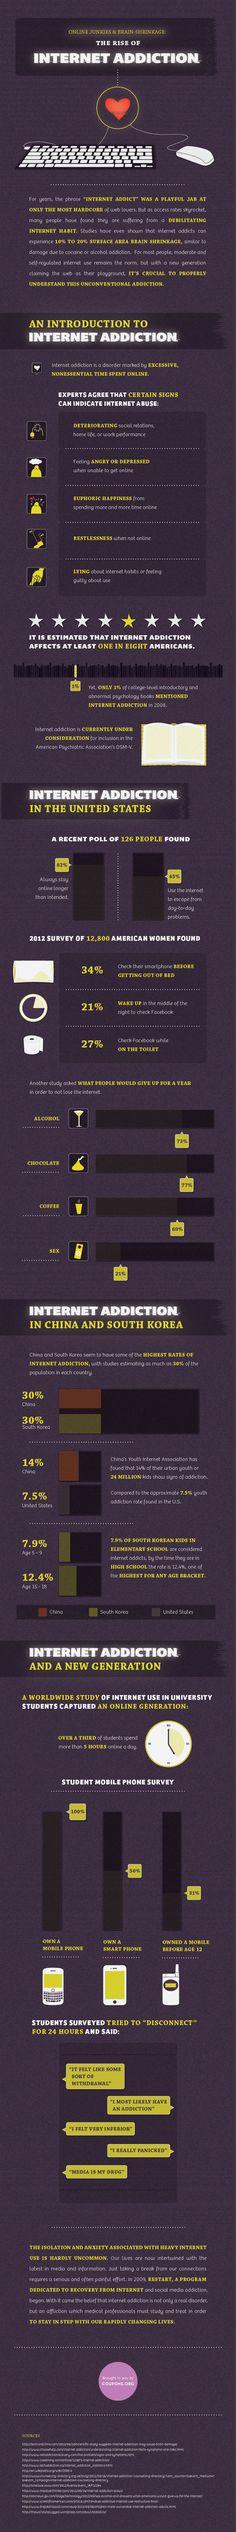 #infographic Internet Addiction